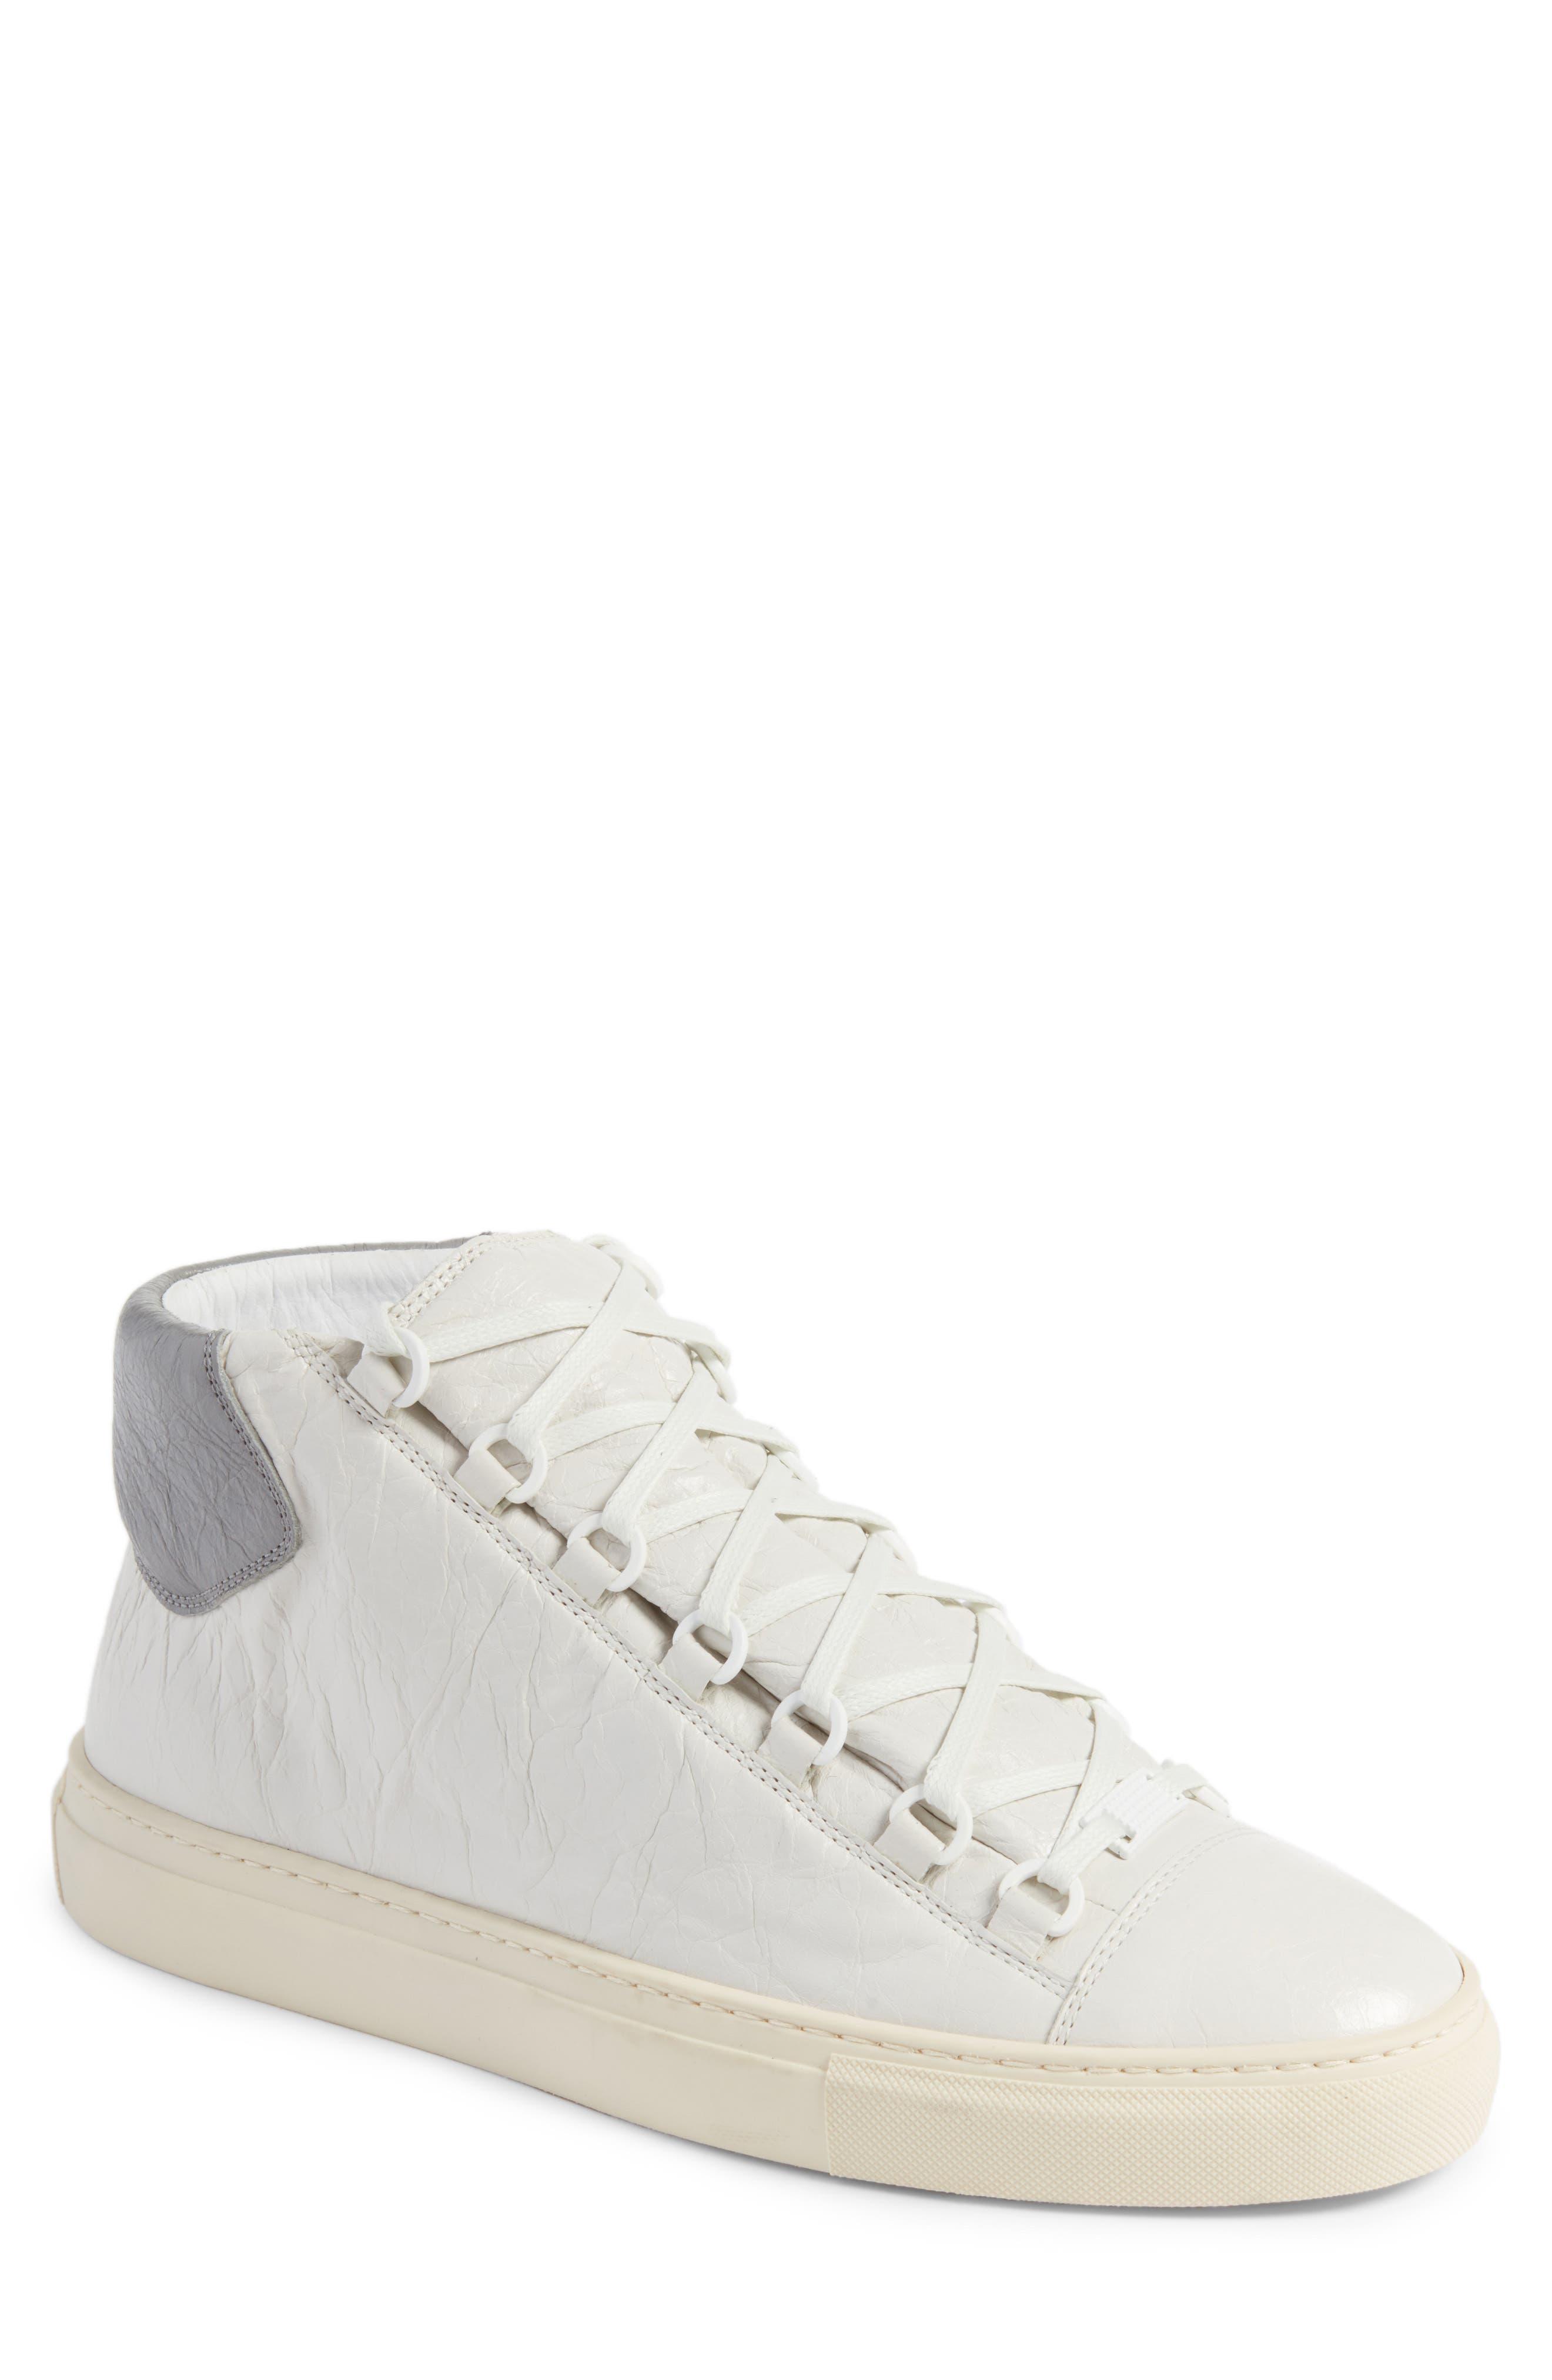 Arena High Sneaker,                         Main,                         color, 167